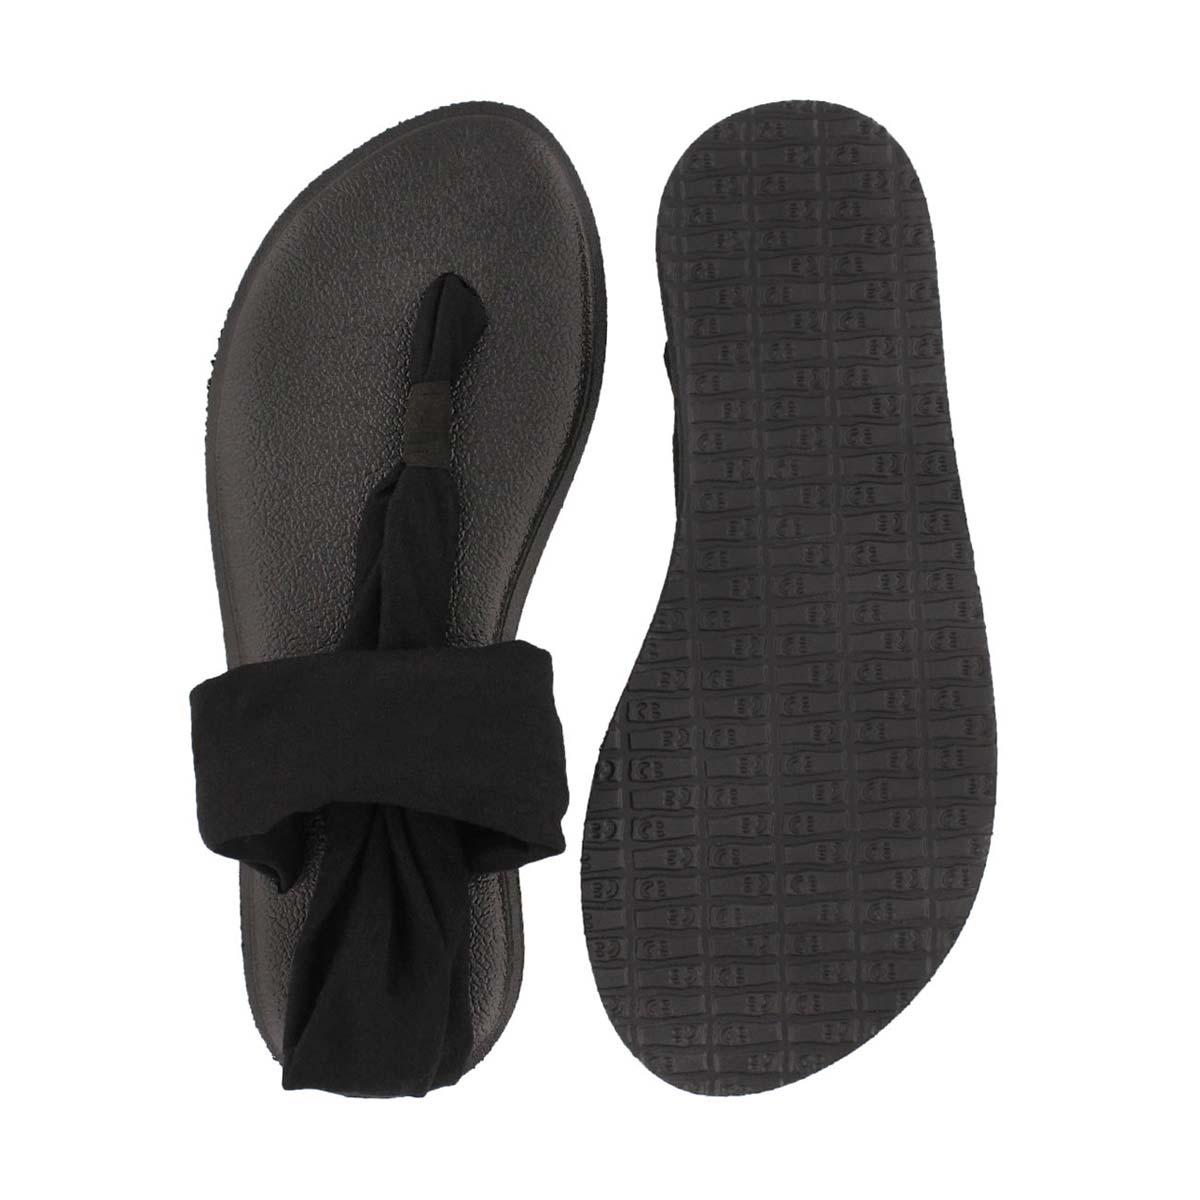 Grls Yoga Sling Burst black thong sandal